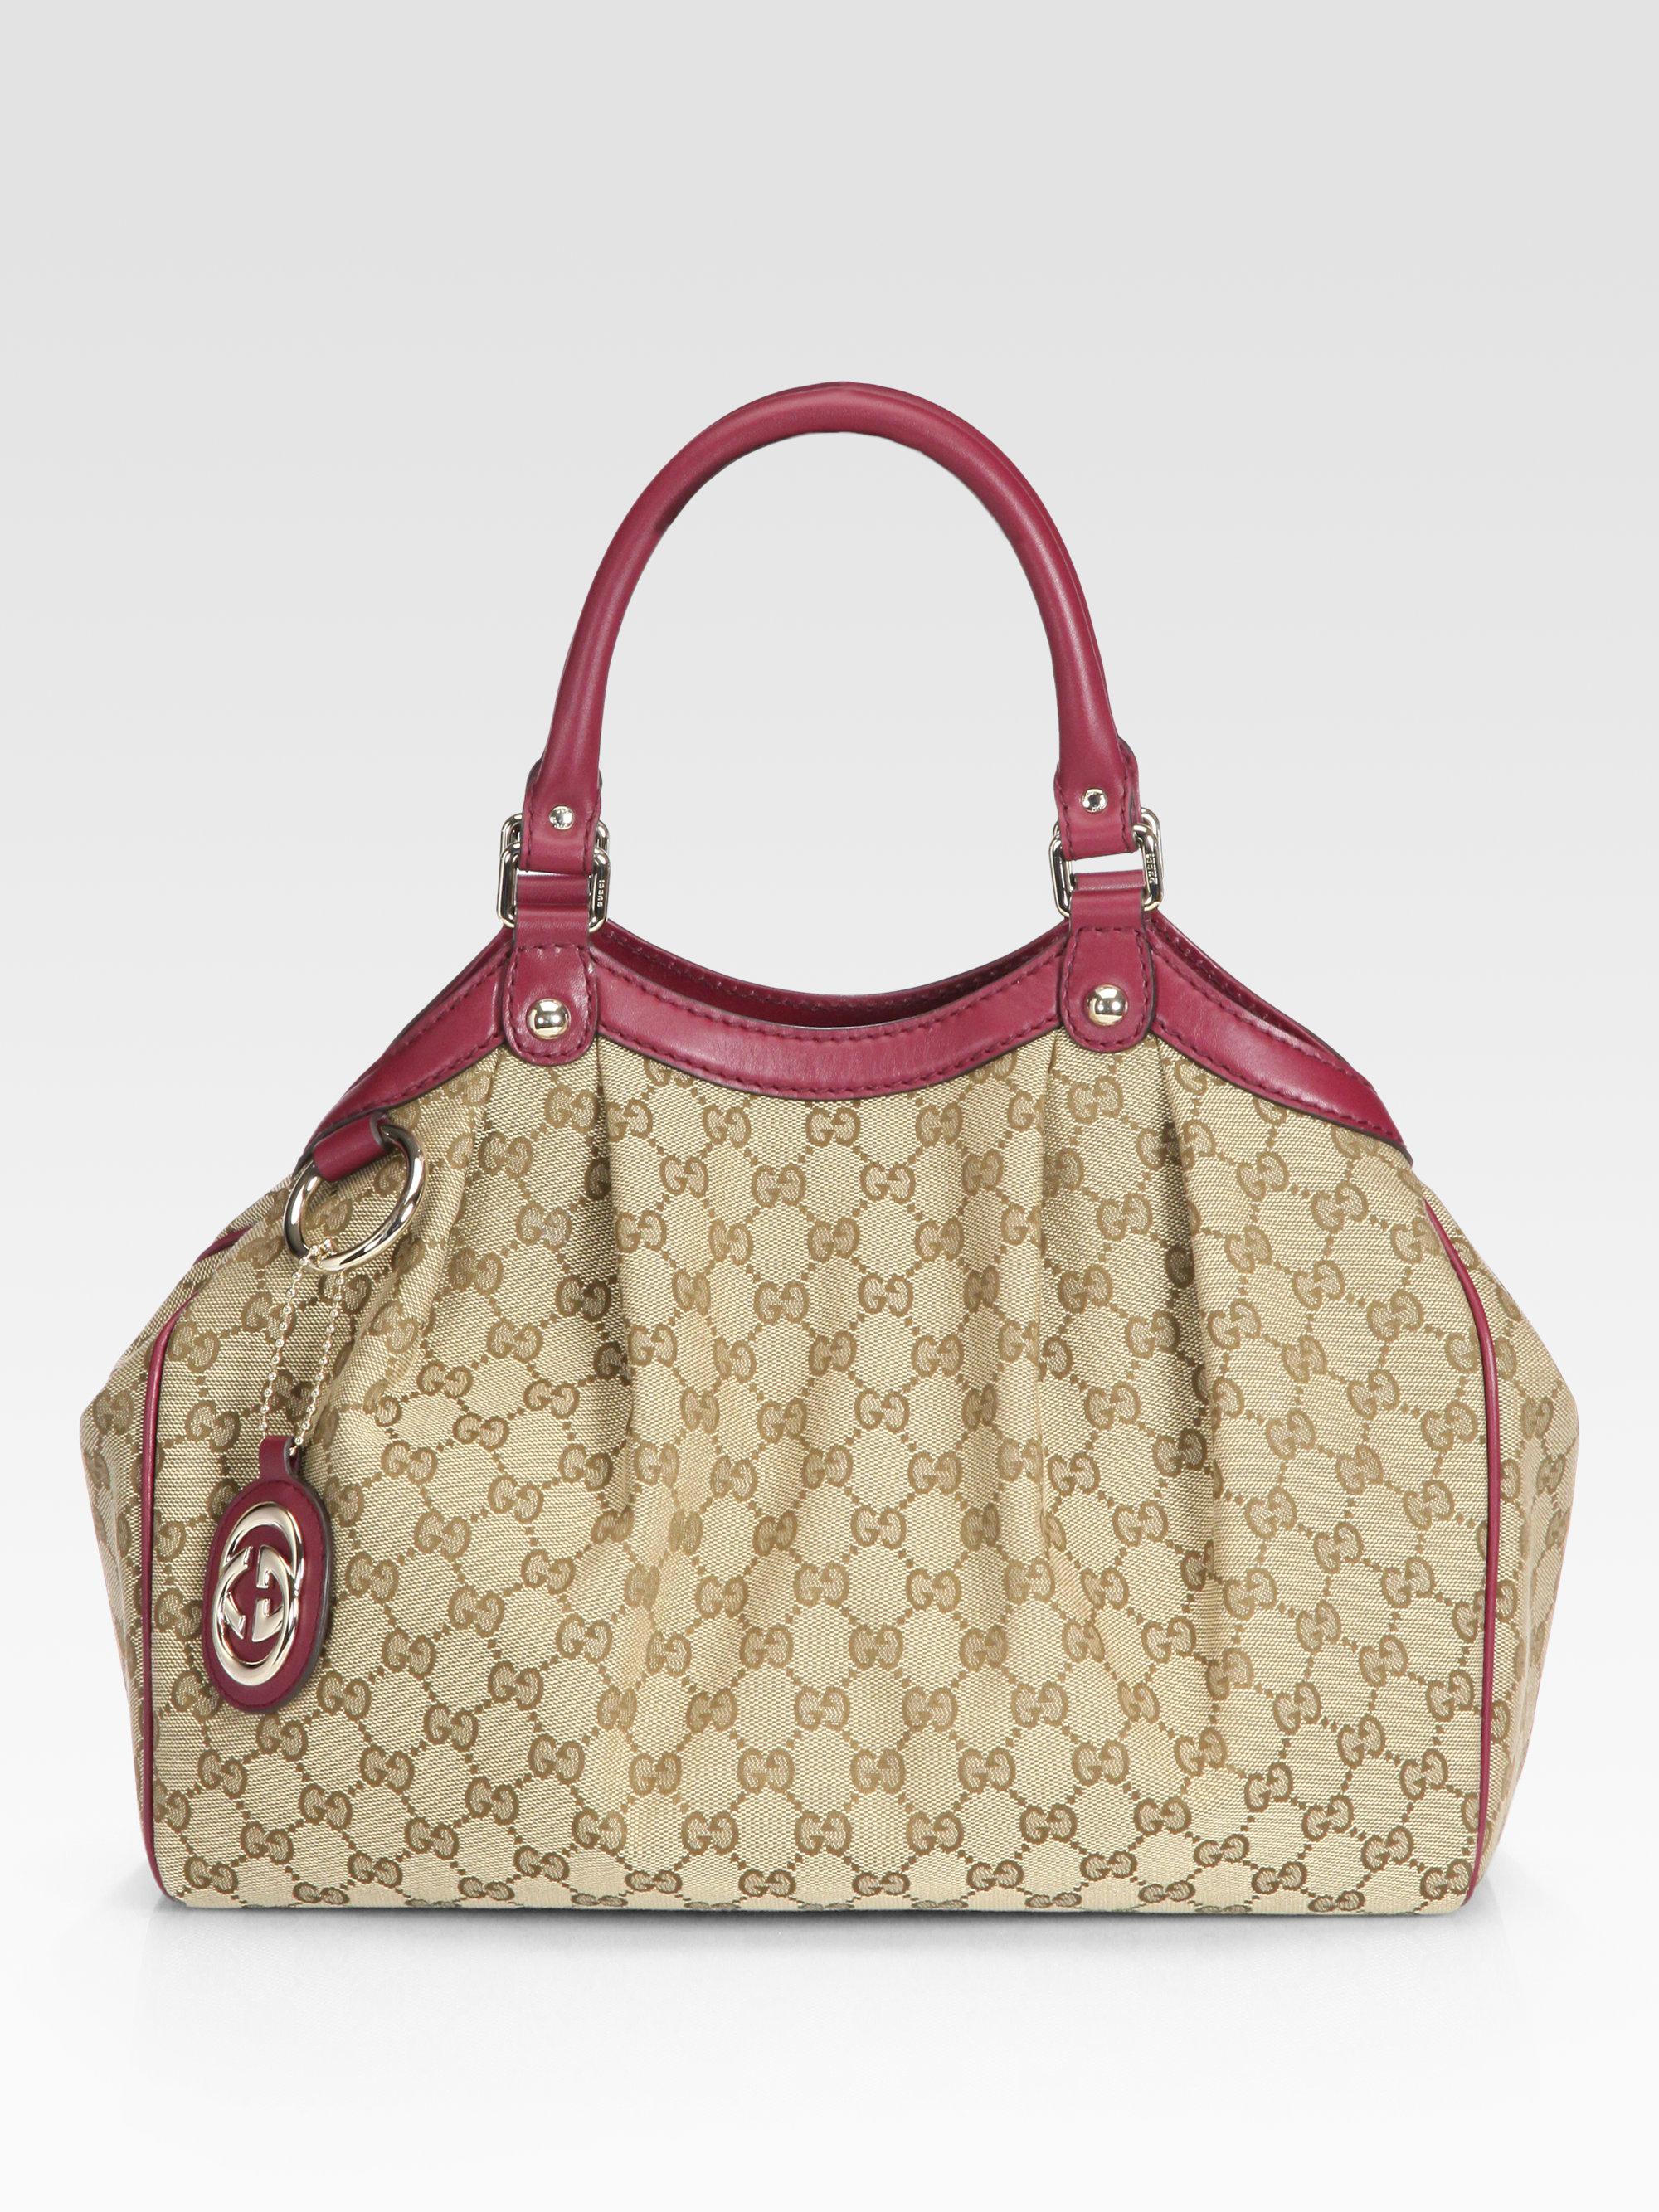 Gucci Gg Sukey Tote Bag Medium - Brown 9c4aokK